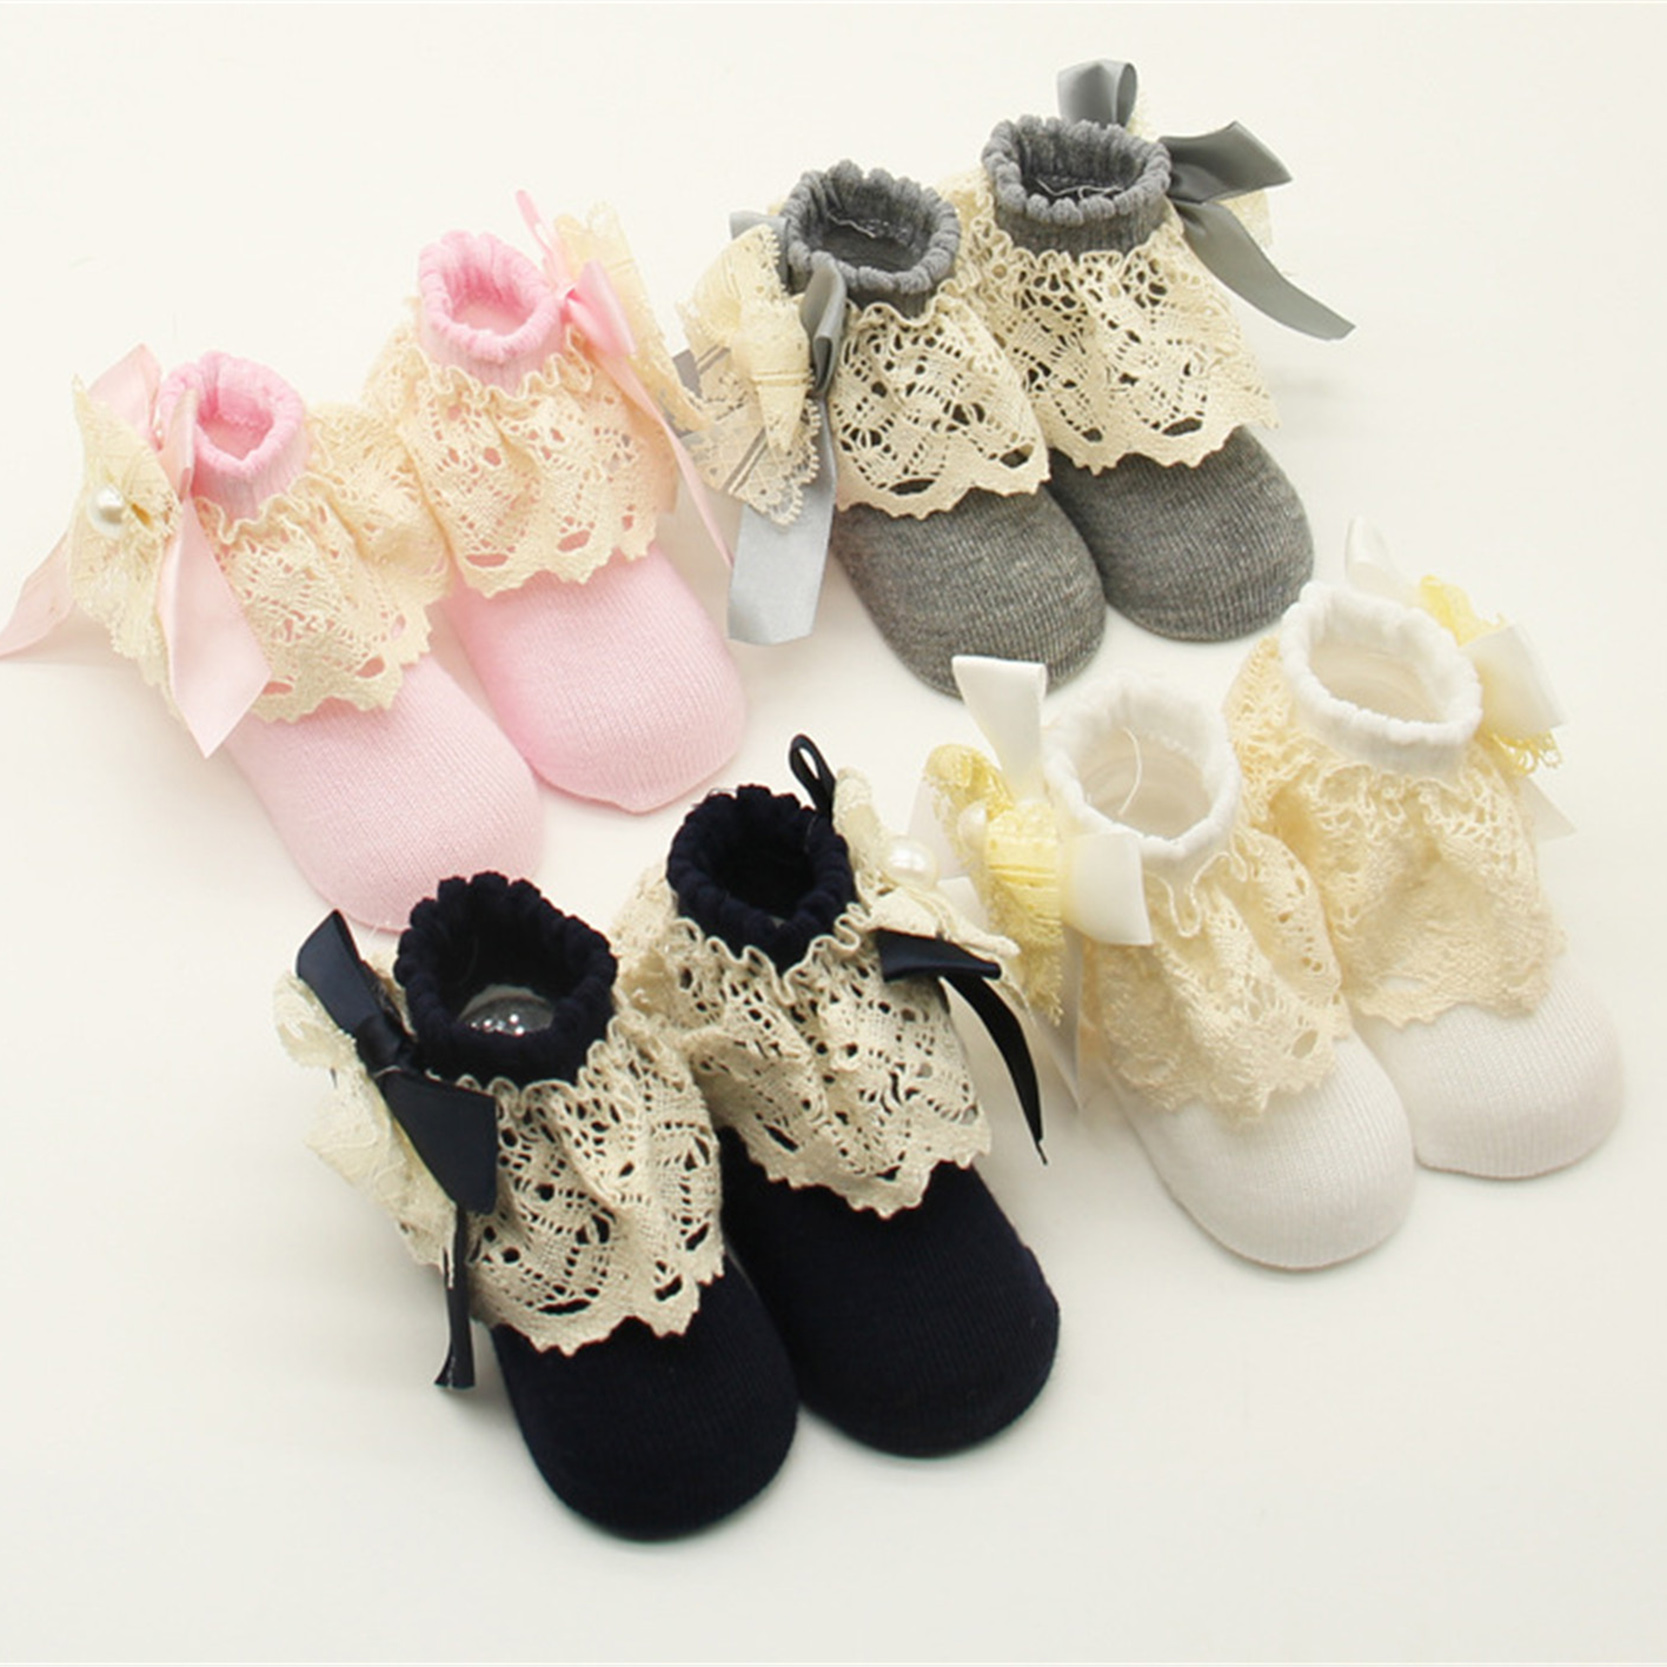 0 12 Months Baby Girls Newborn Socks Infant Ankle Shoes Socks Kids